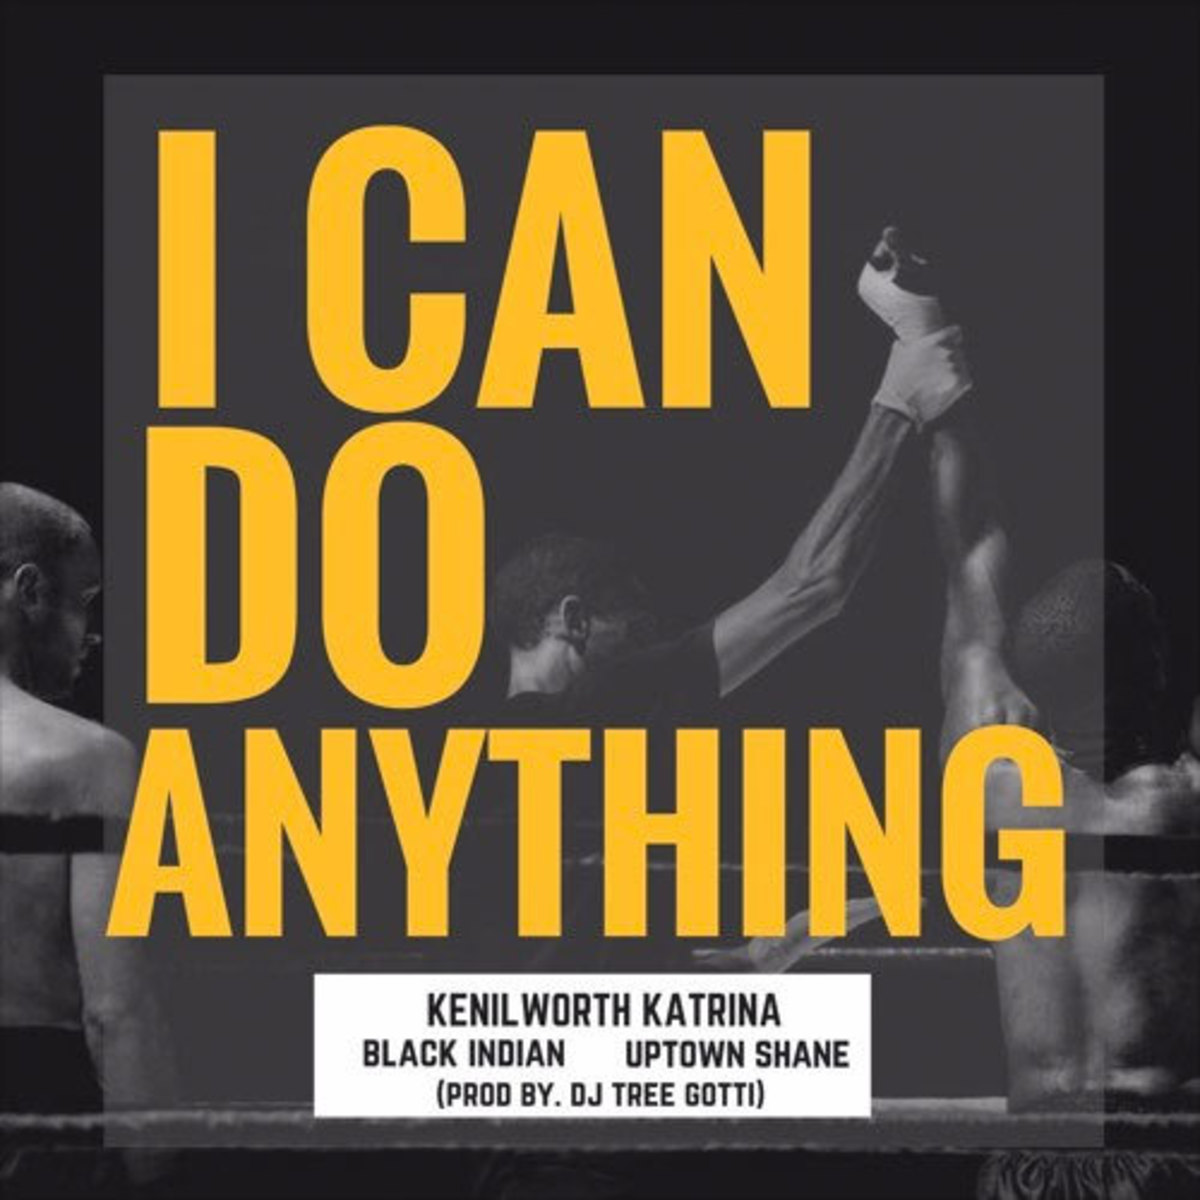 kenilworth-katrina-i-can-do-anything.jpg